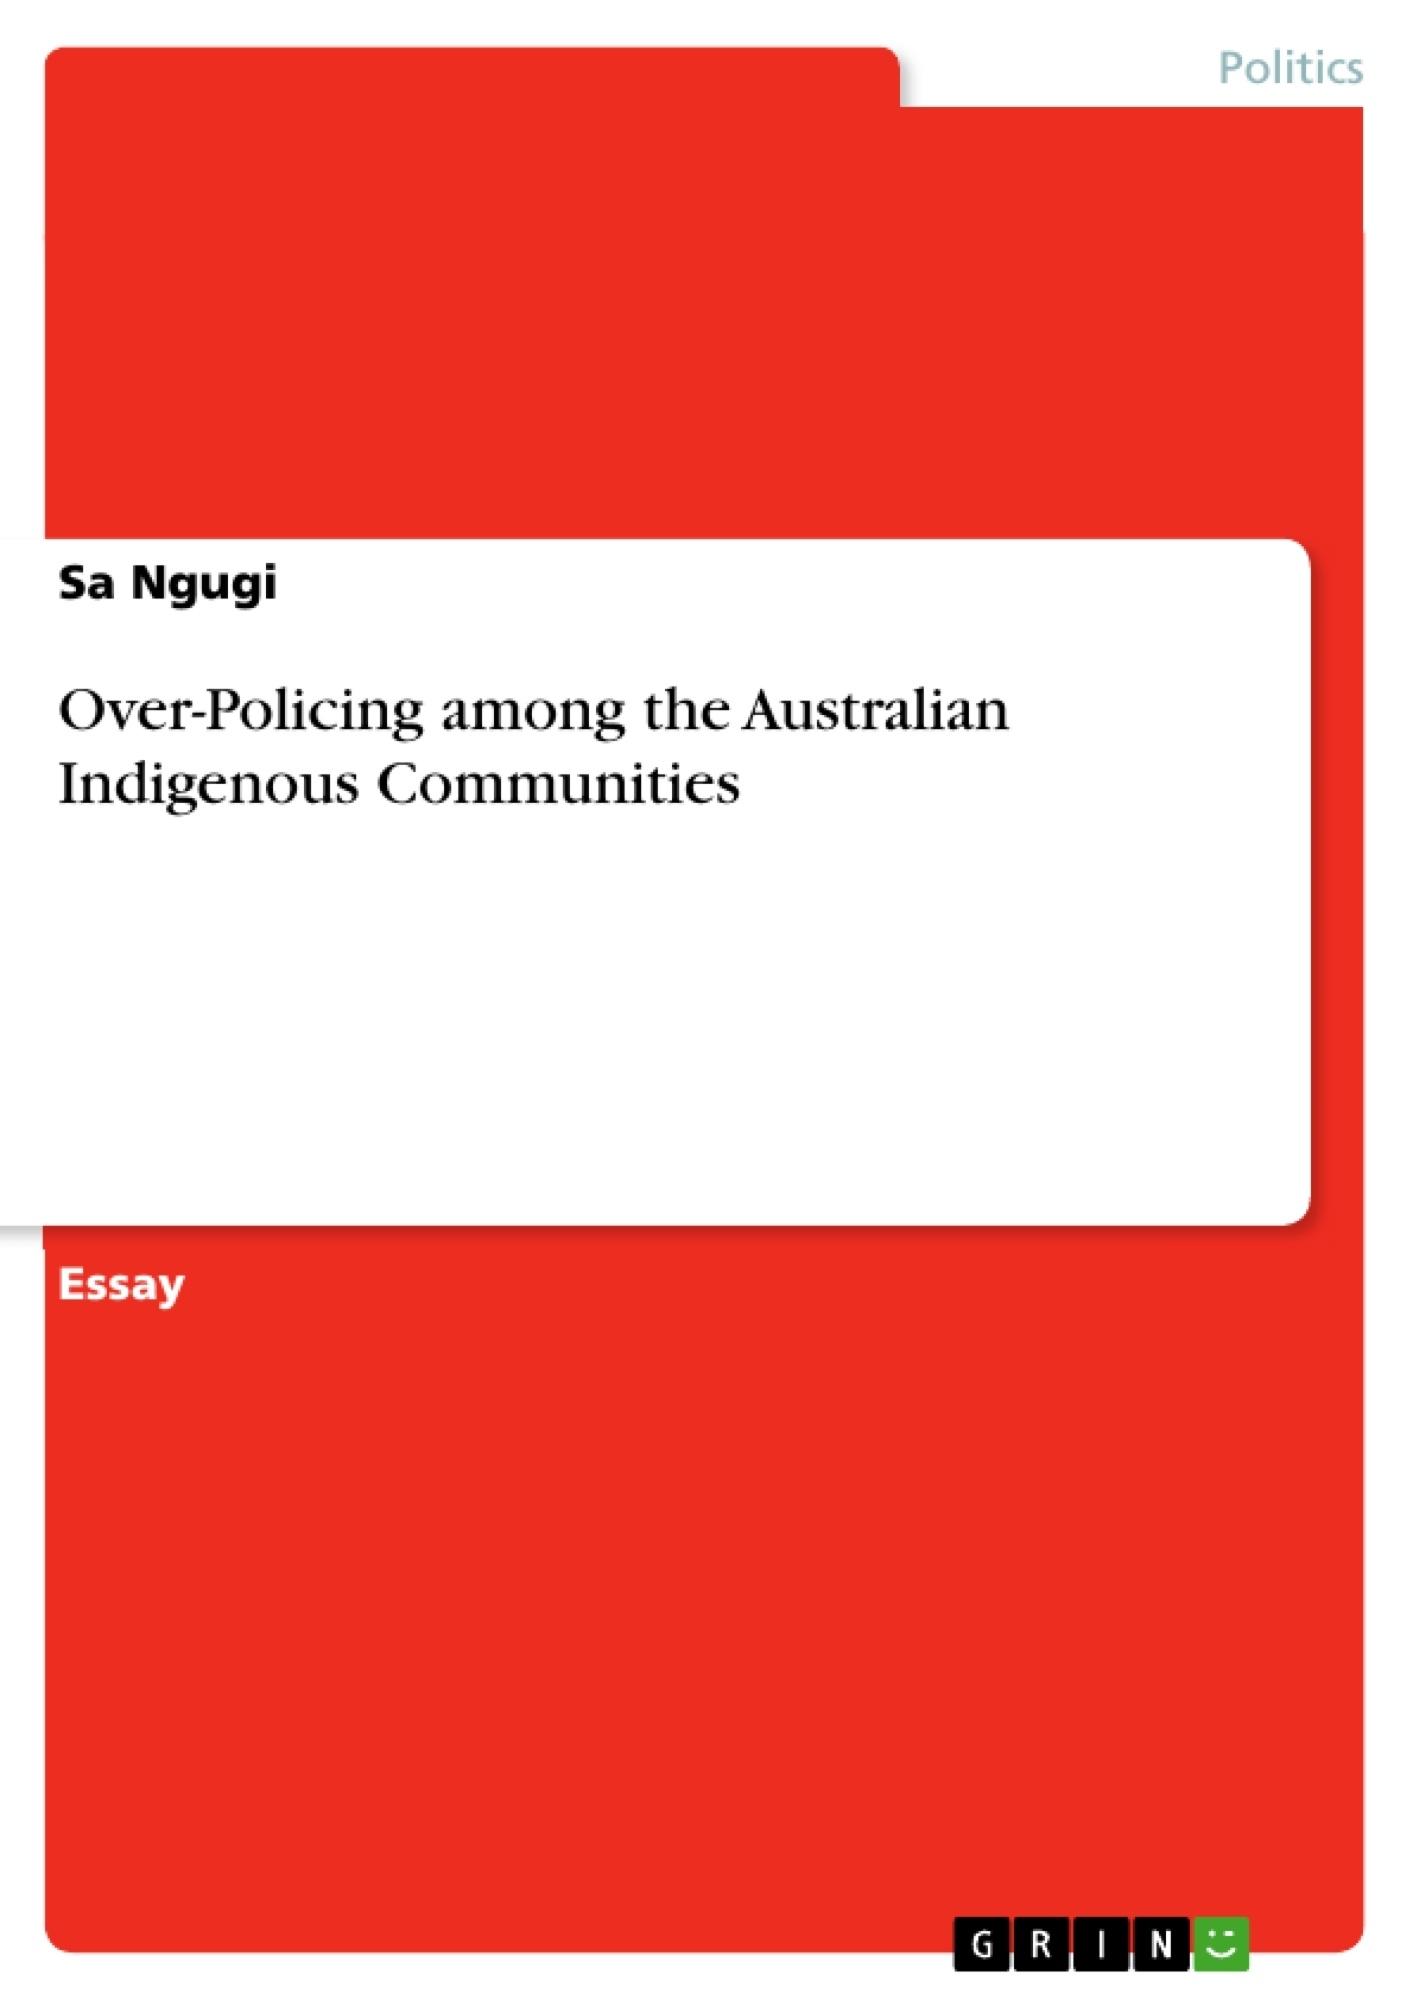 Indigenous disadvantage in Australia